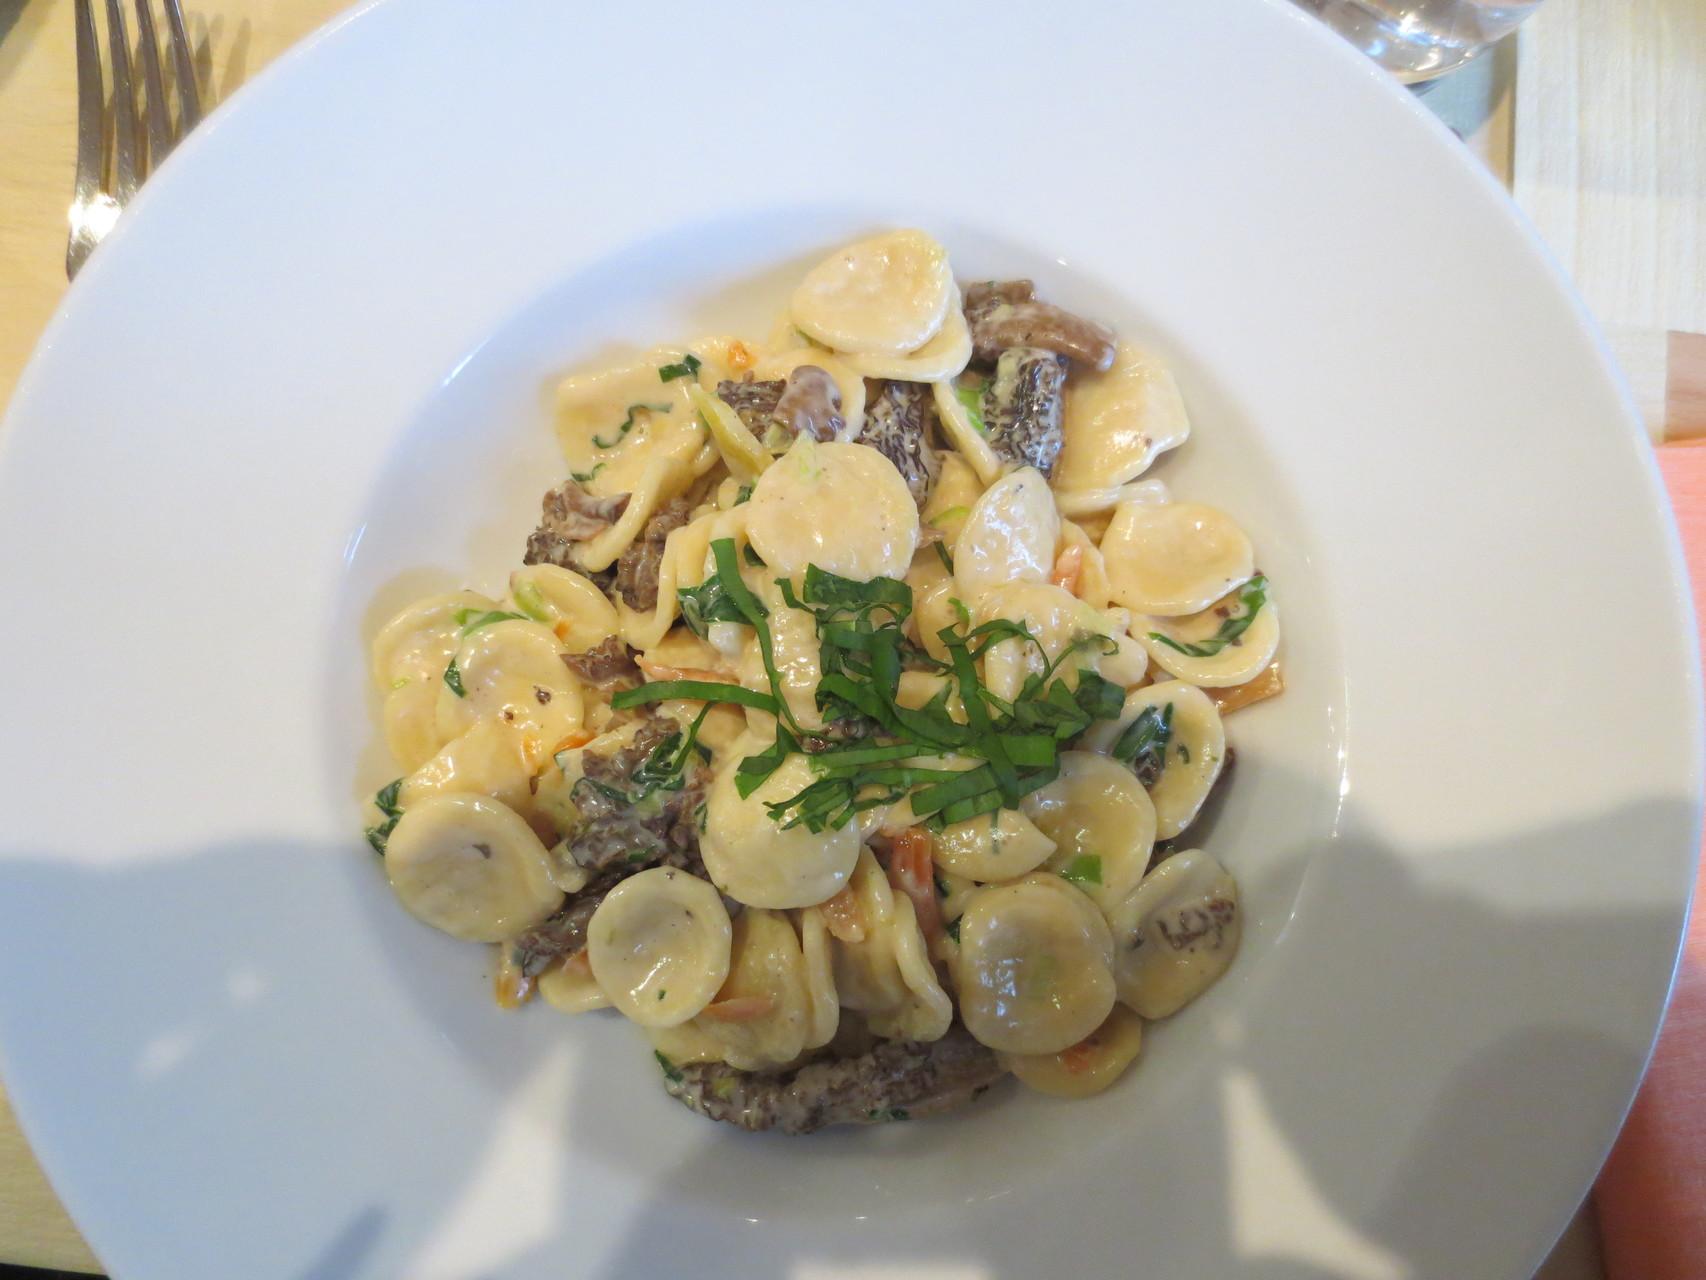 Menu VDSV-Business-Lunch: Orecchiette Frühlingsmorcheln (Teigwaren-Gericht mit gedünsteten Morcheln, Egerkinger Bärlauch, Frühlingszwiebeln und Karottenstreifen)